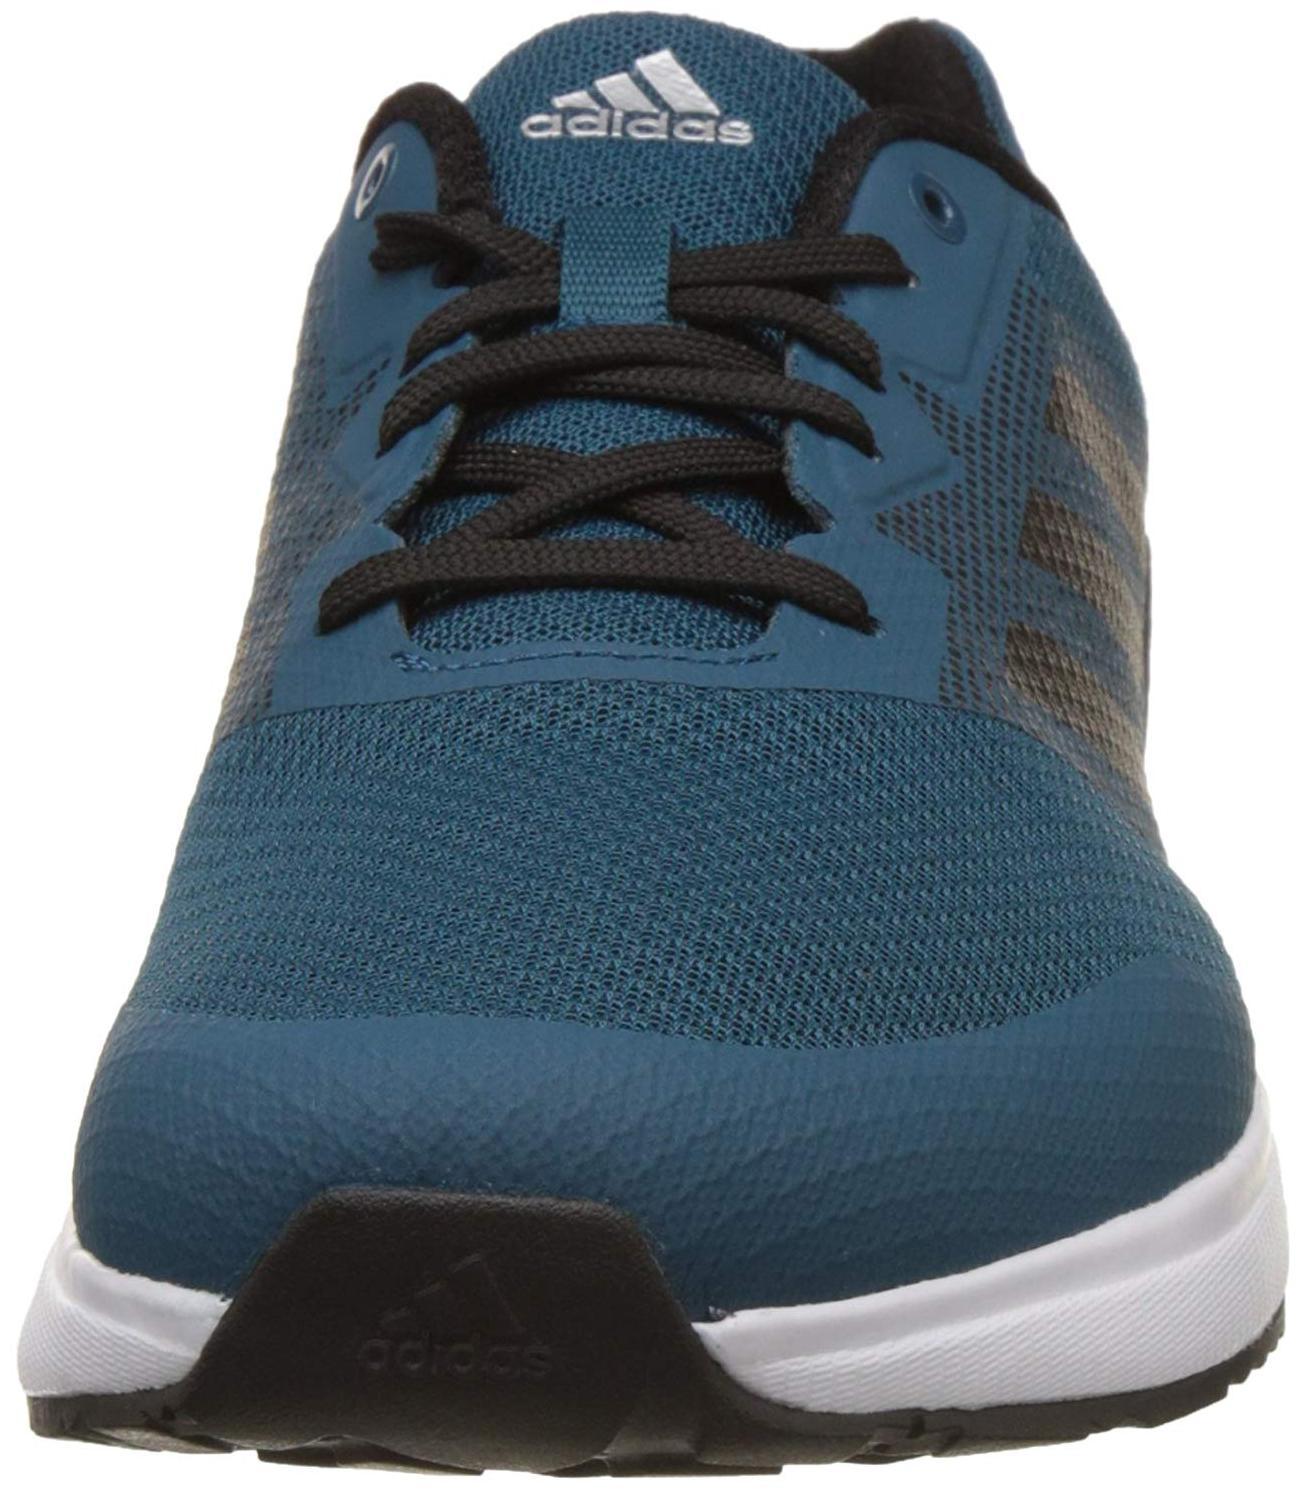 Adidas Men Safiro M Running Shoes for